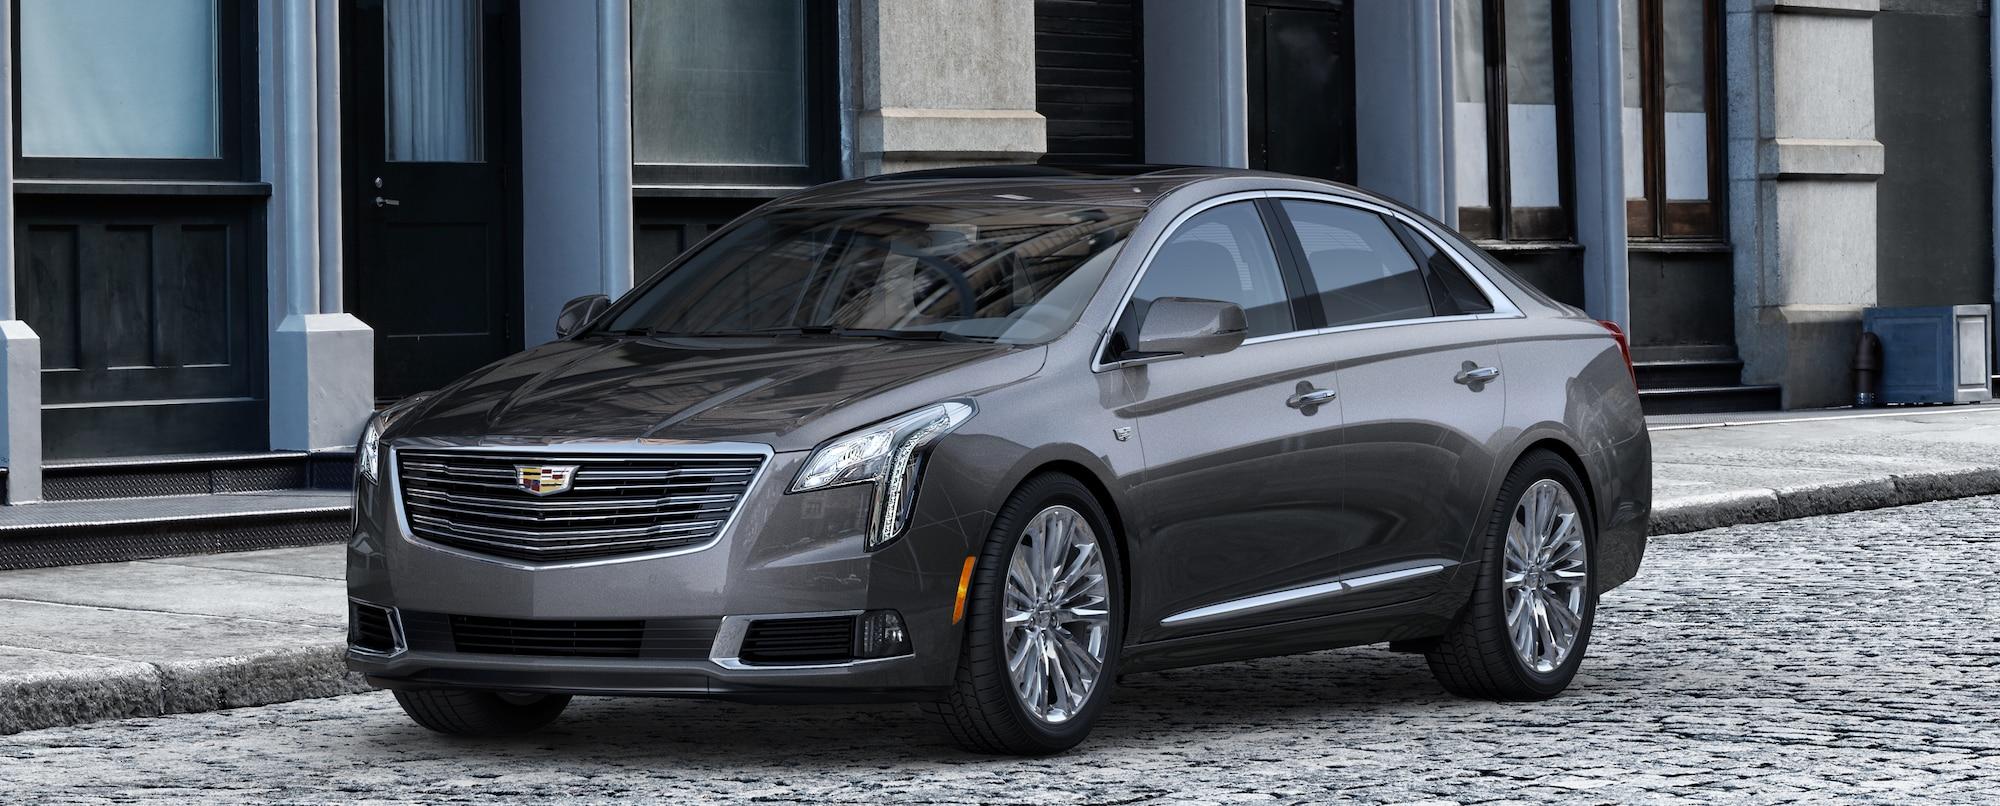 2019 xts sedan cadillac rh cadillac com Cadillac ETC Future Large Cadillac Sedan